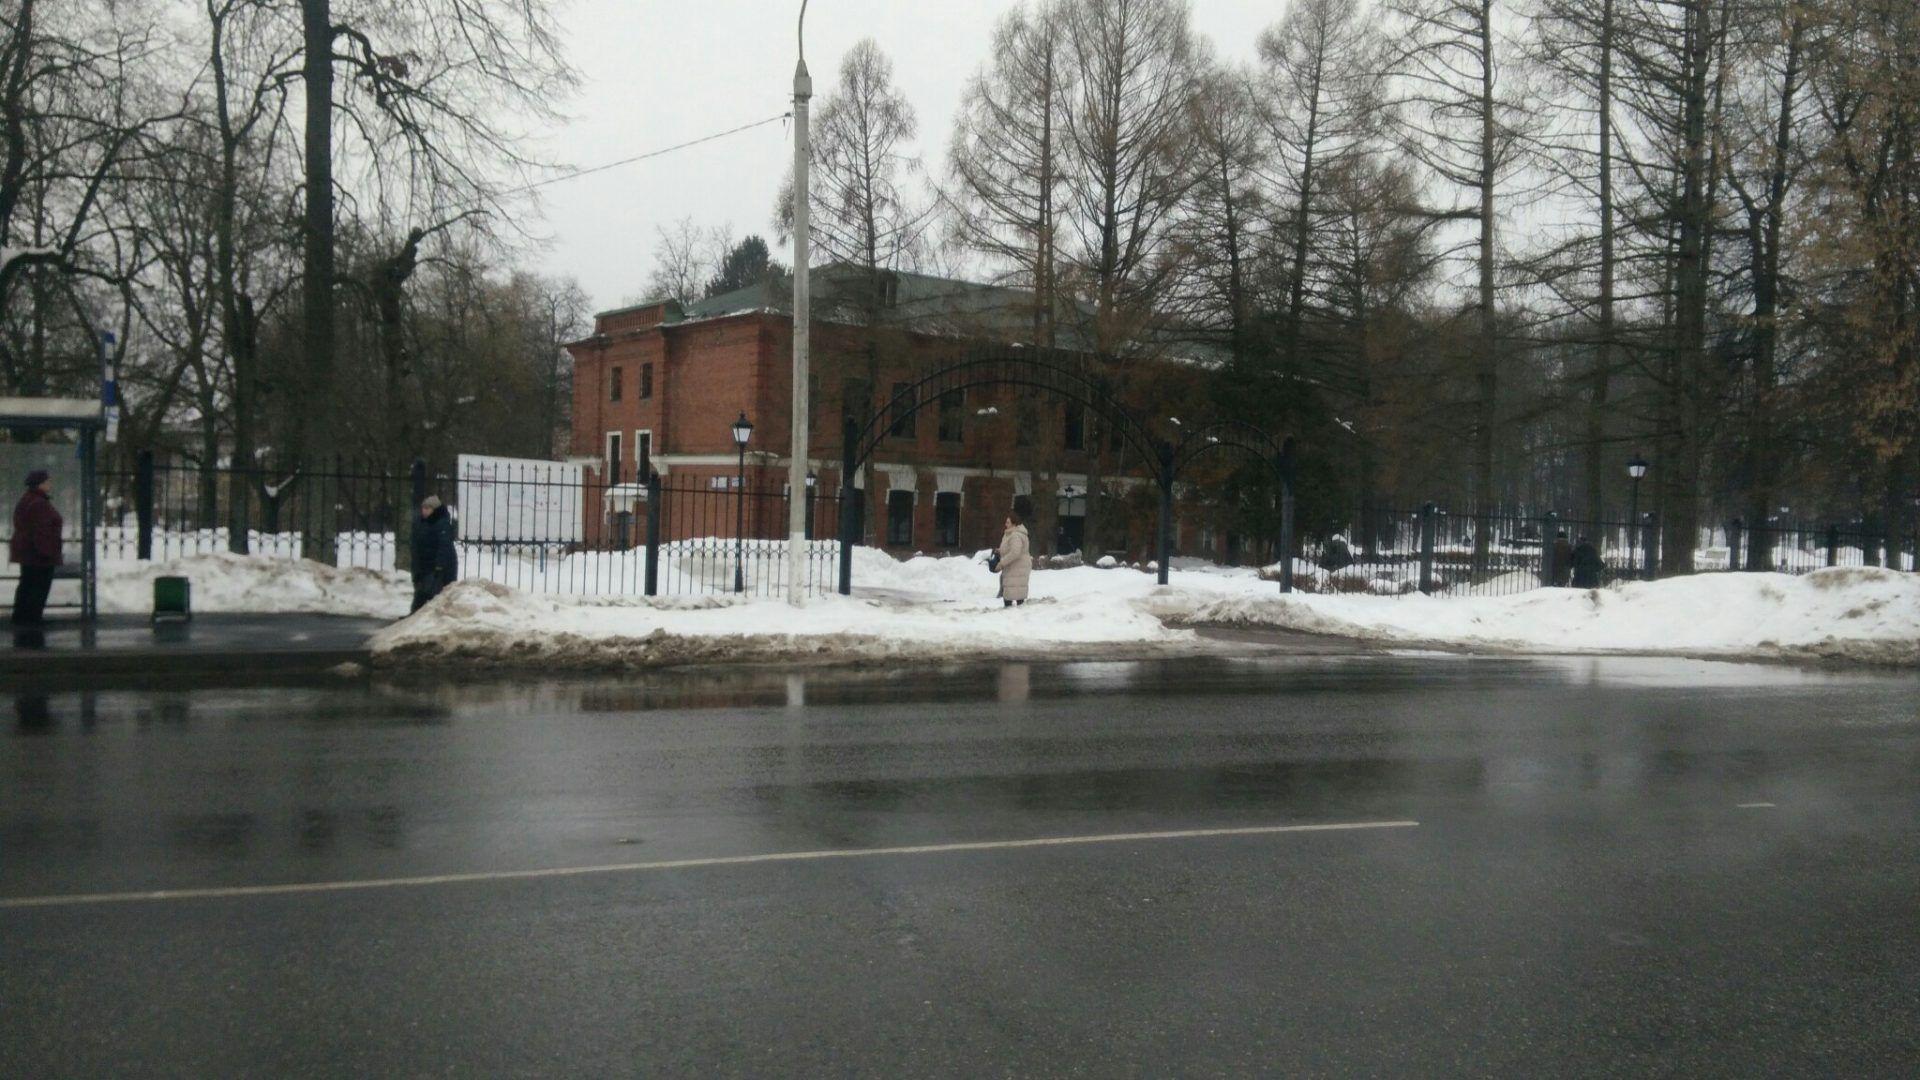 Музей-усадьба Александрово-Щапово. Вид с улицы. Фото: Максим Землянский